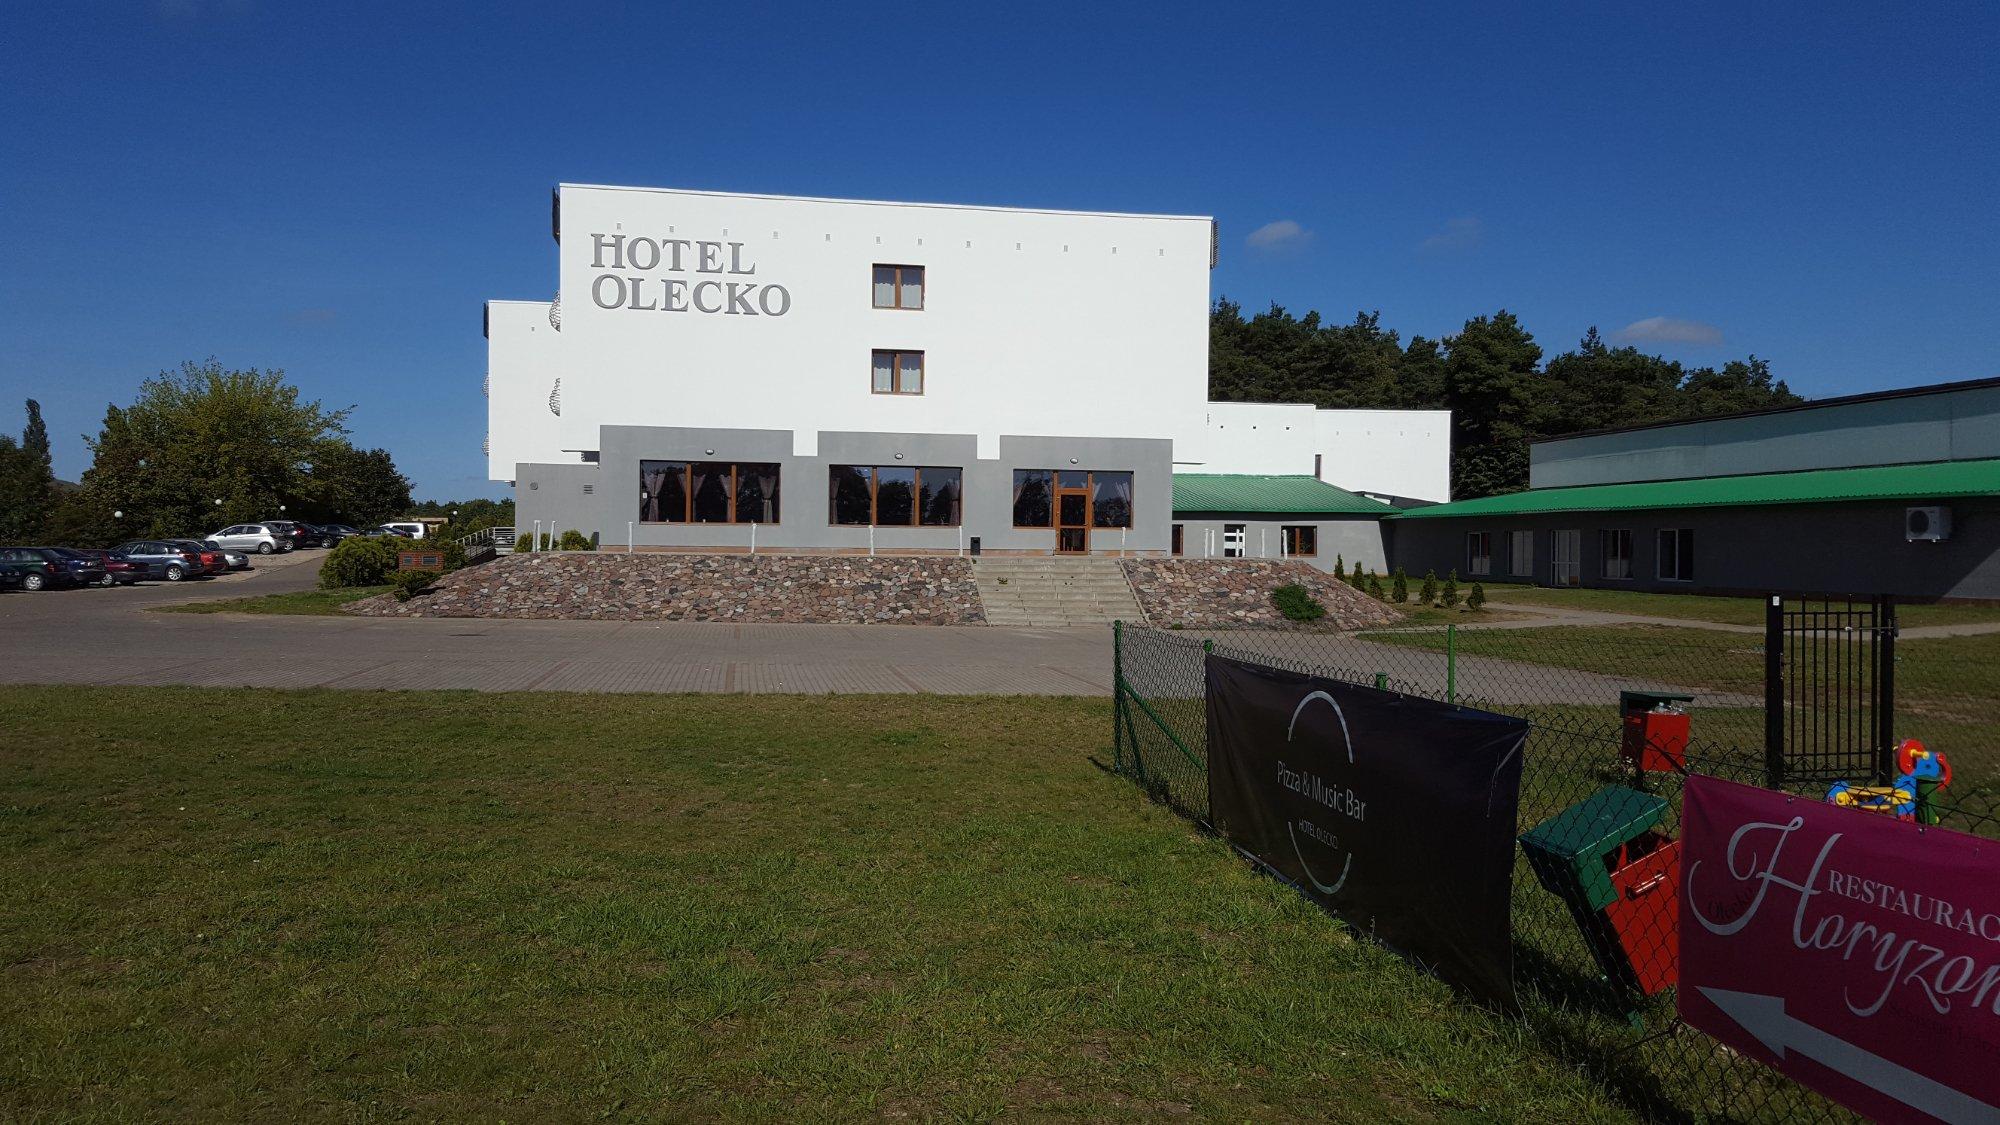 Hotel Olecko